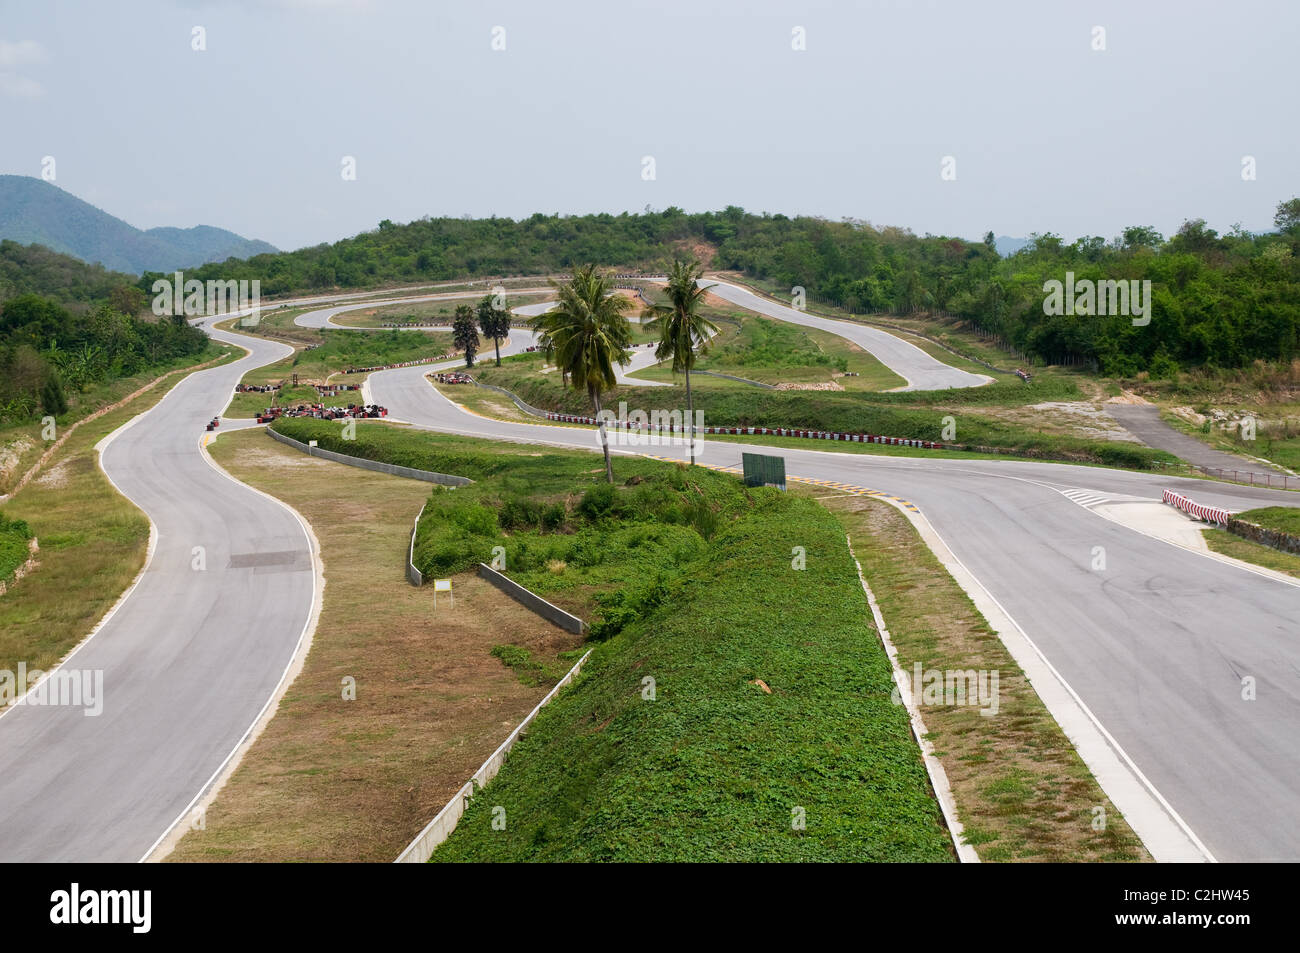 The Kaeng Krachan race circuit in Petchaburi province, Thailand with no cars. Stock Photo